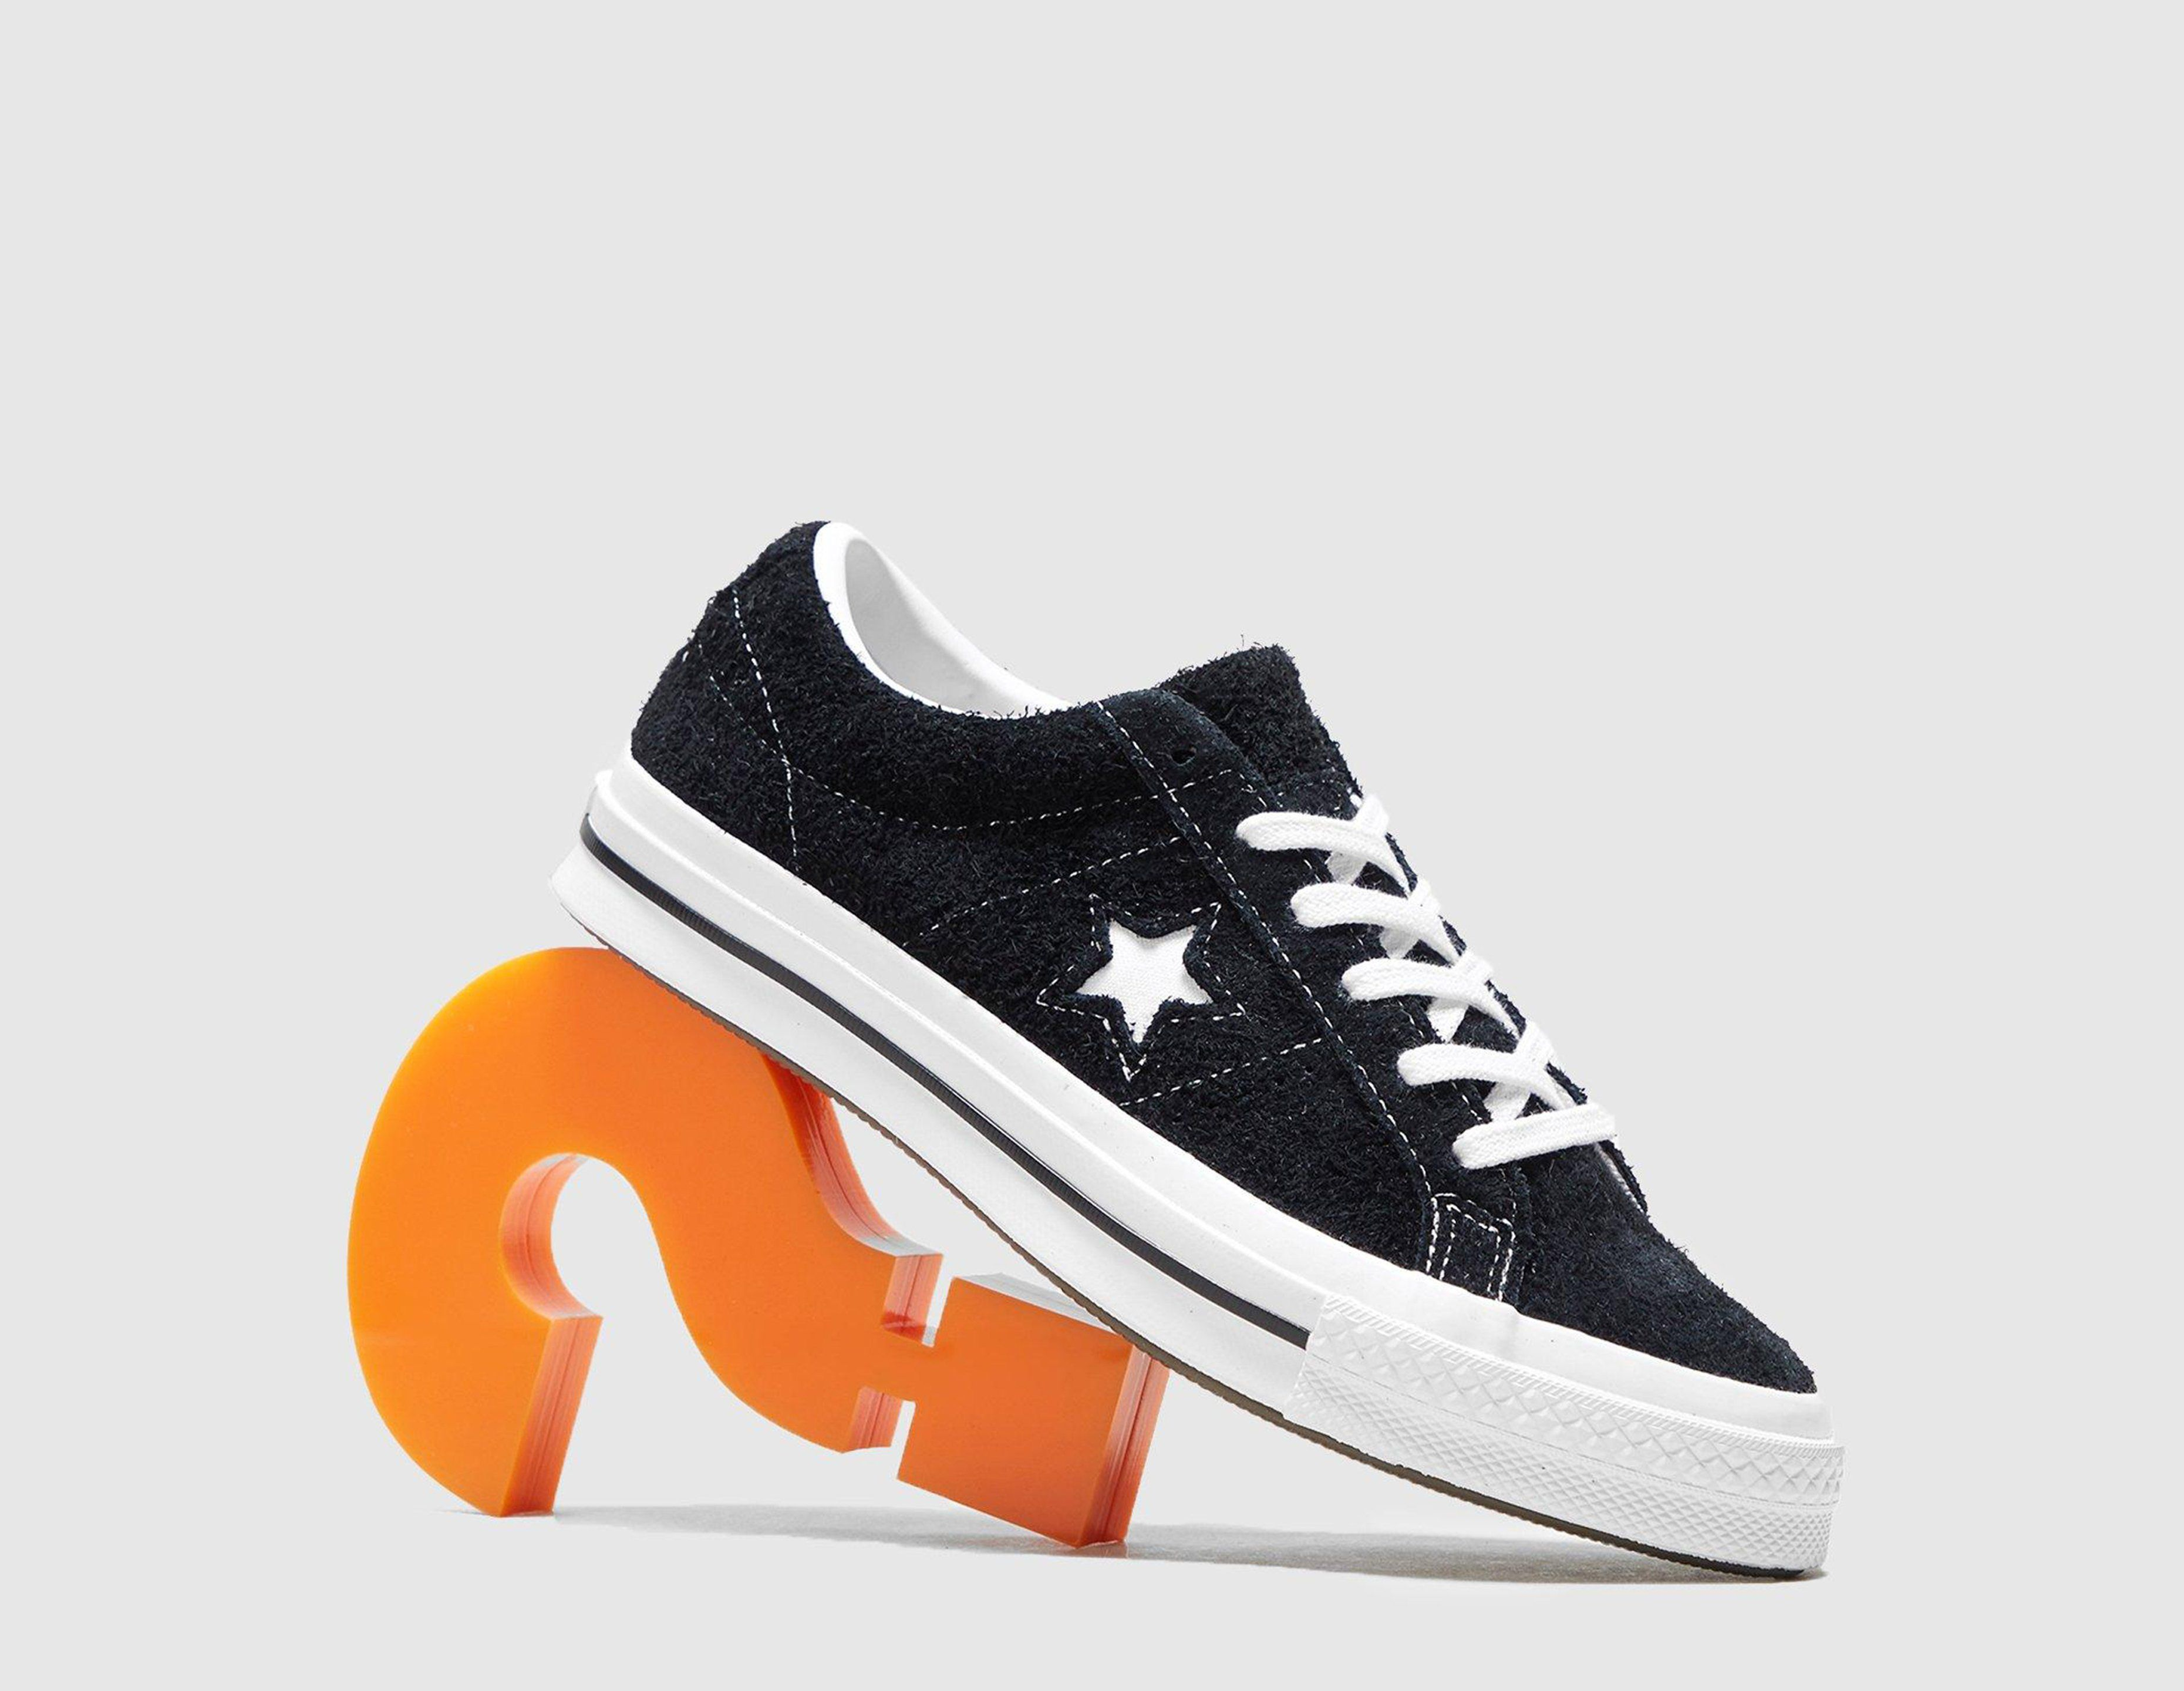 converse single women Shop clearance converse shoes at champs sports skip to main converse all star ox - women's width - b - medium satin $6499 $4499 converse.